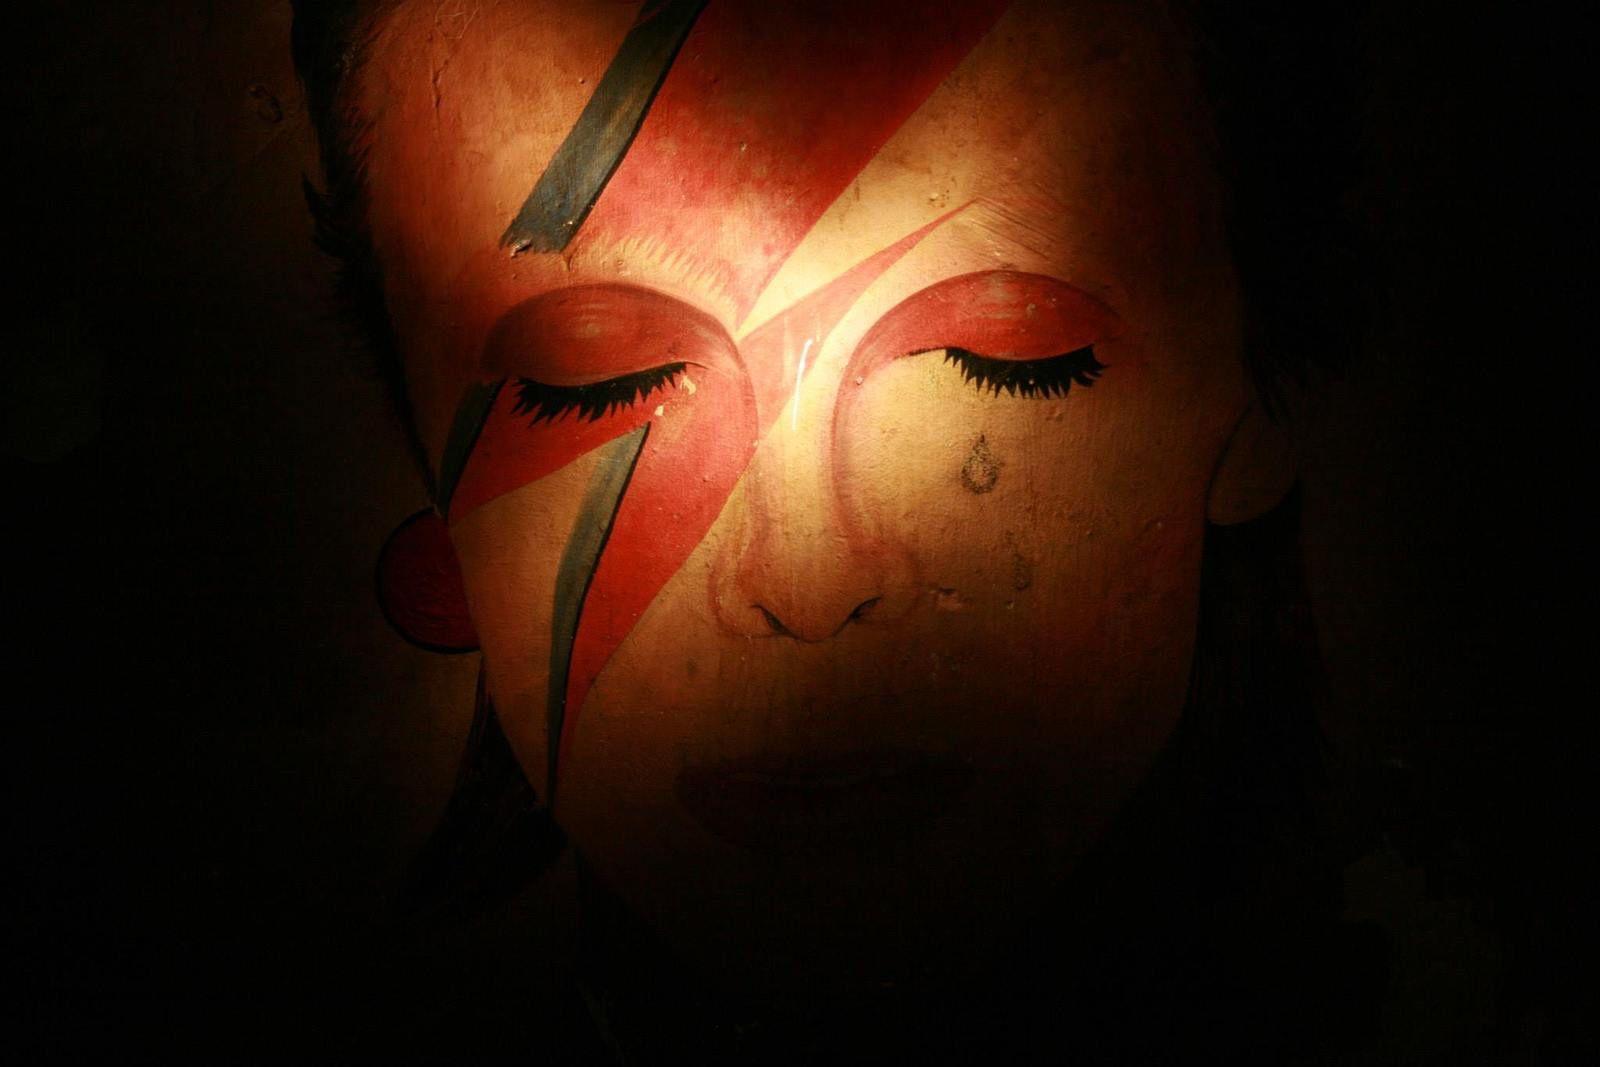 New : The Guru Guru + Longlost + Six Hands @ Rock Classic - 10/01/2014 - 20h30 - Entrée gratuite !